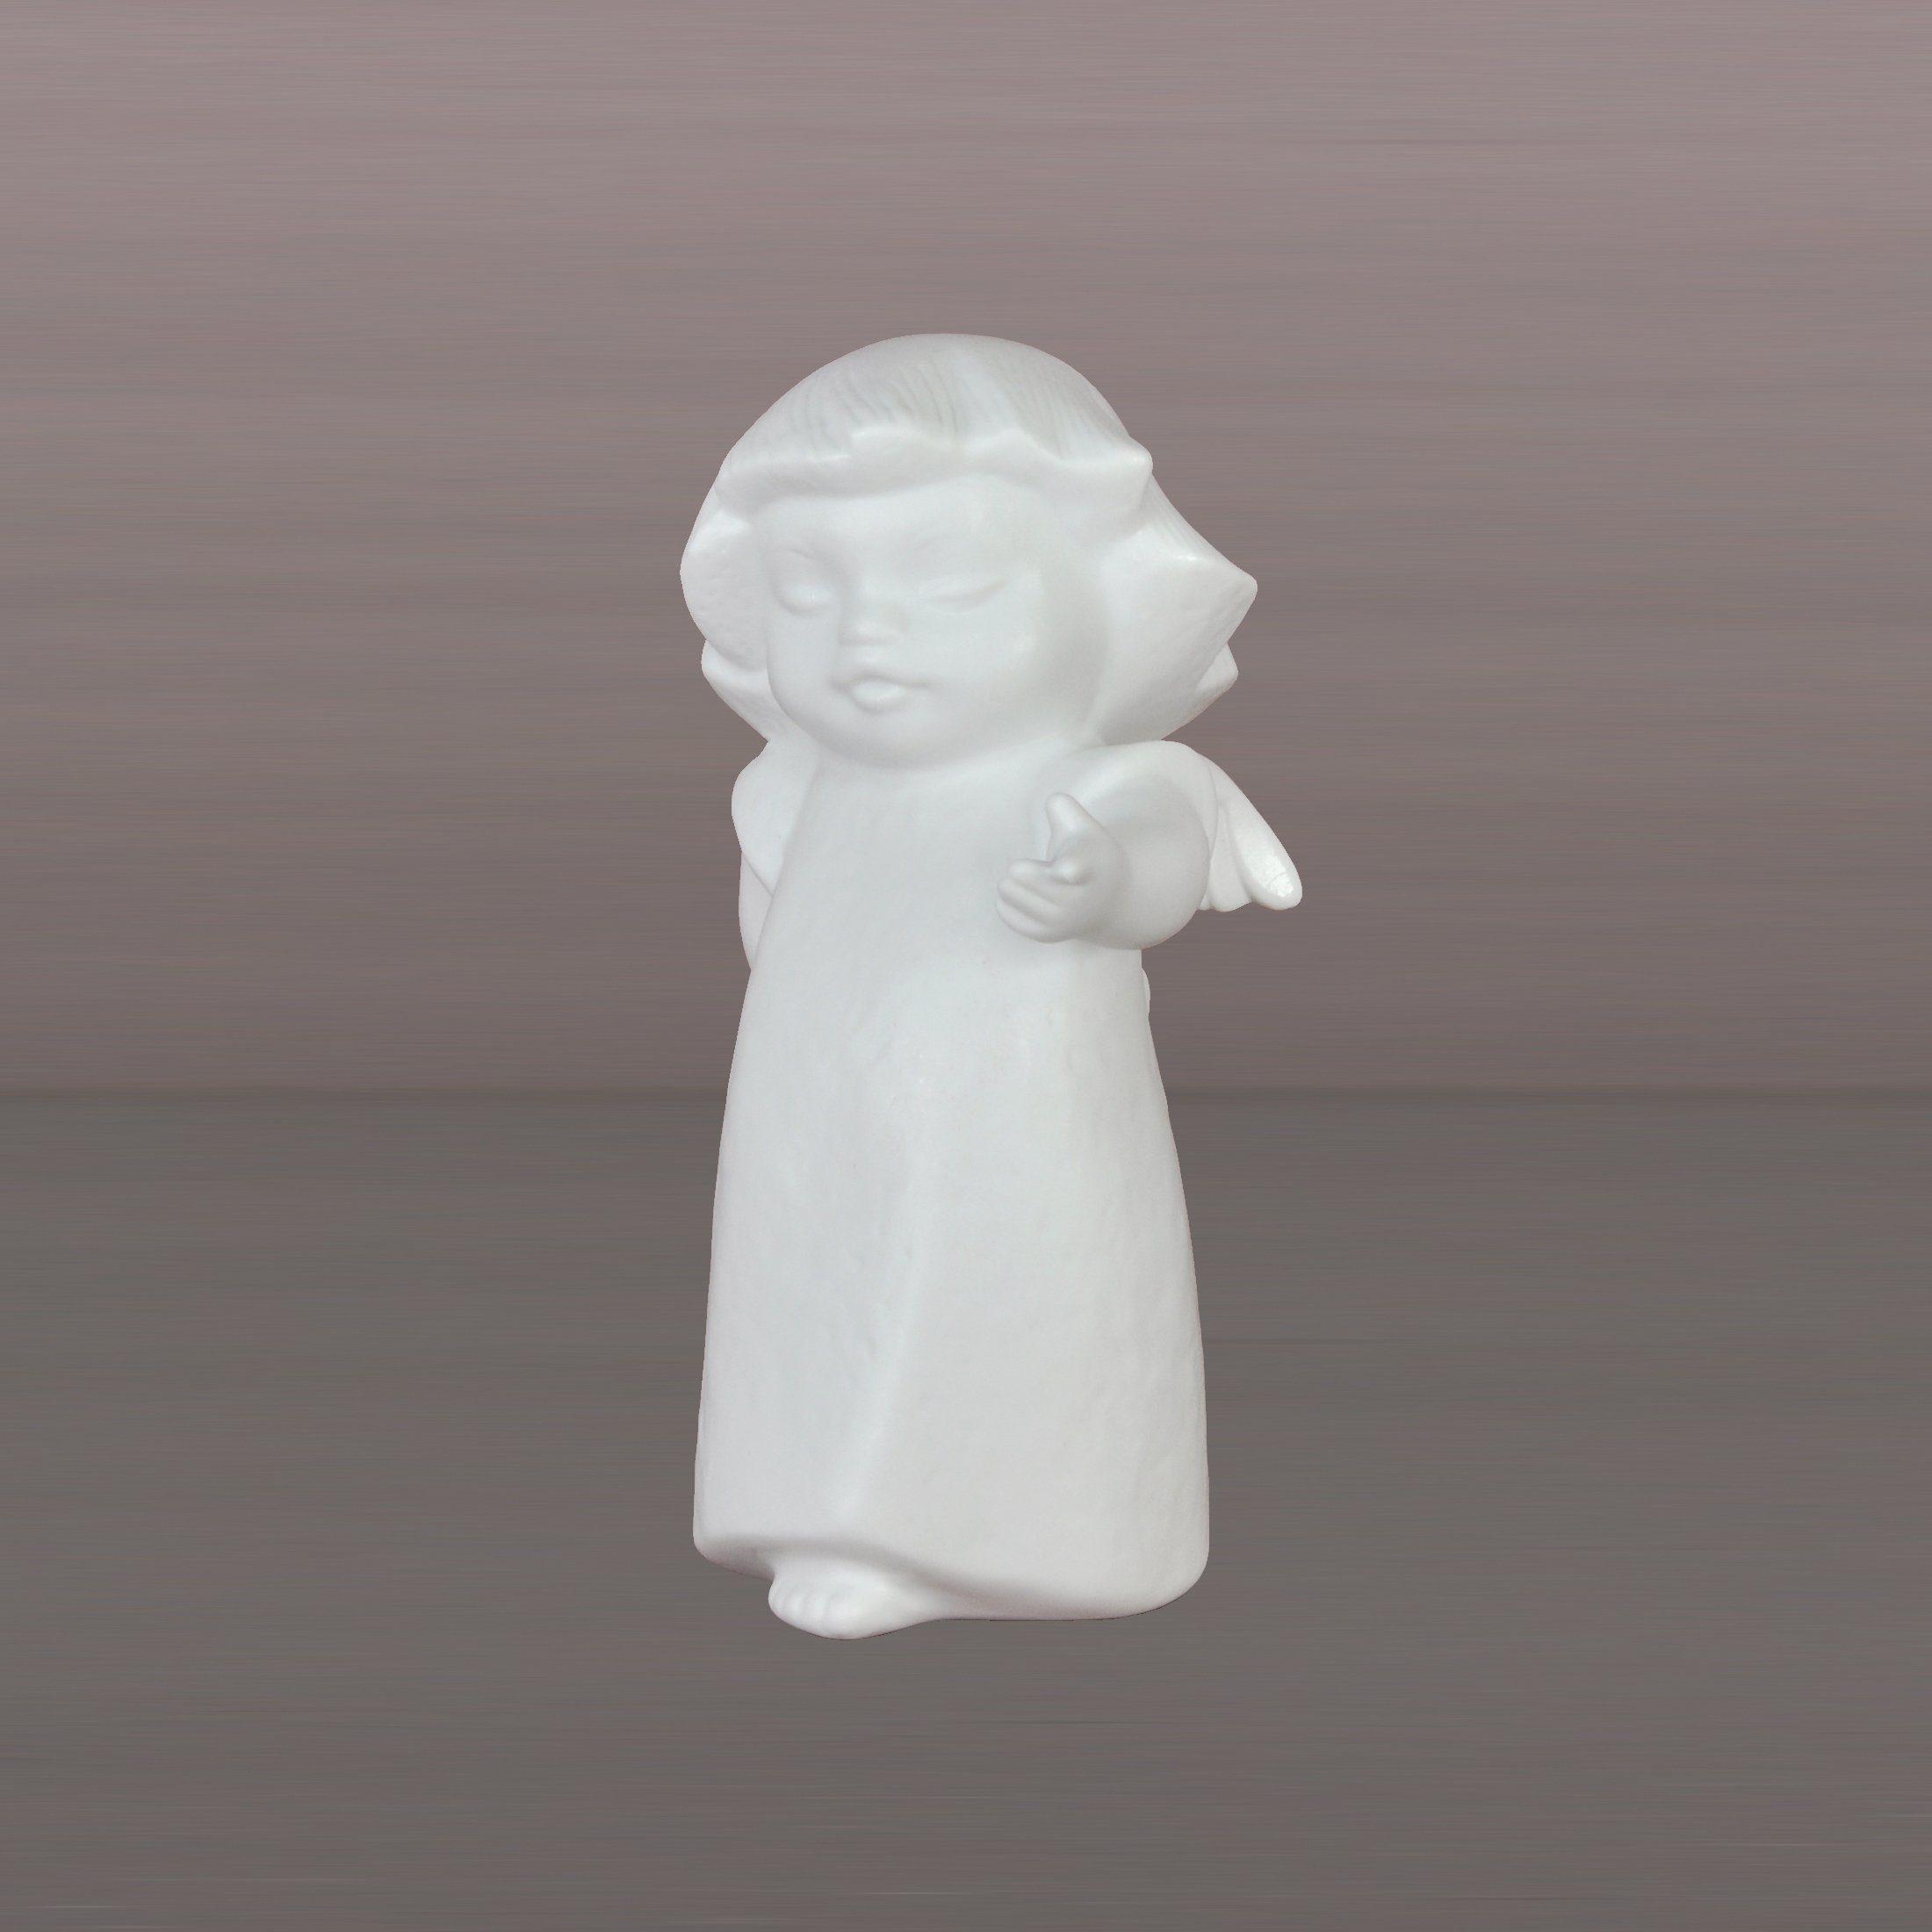 Kaiser Porzellan Der Flüsterer »Engel-Kinder«